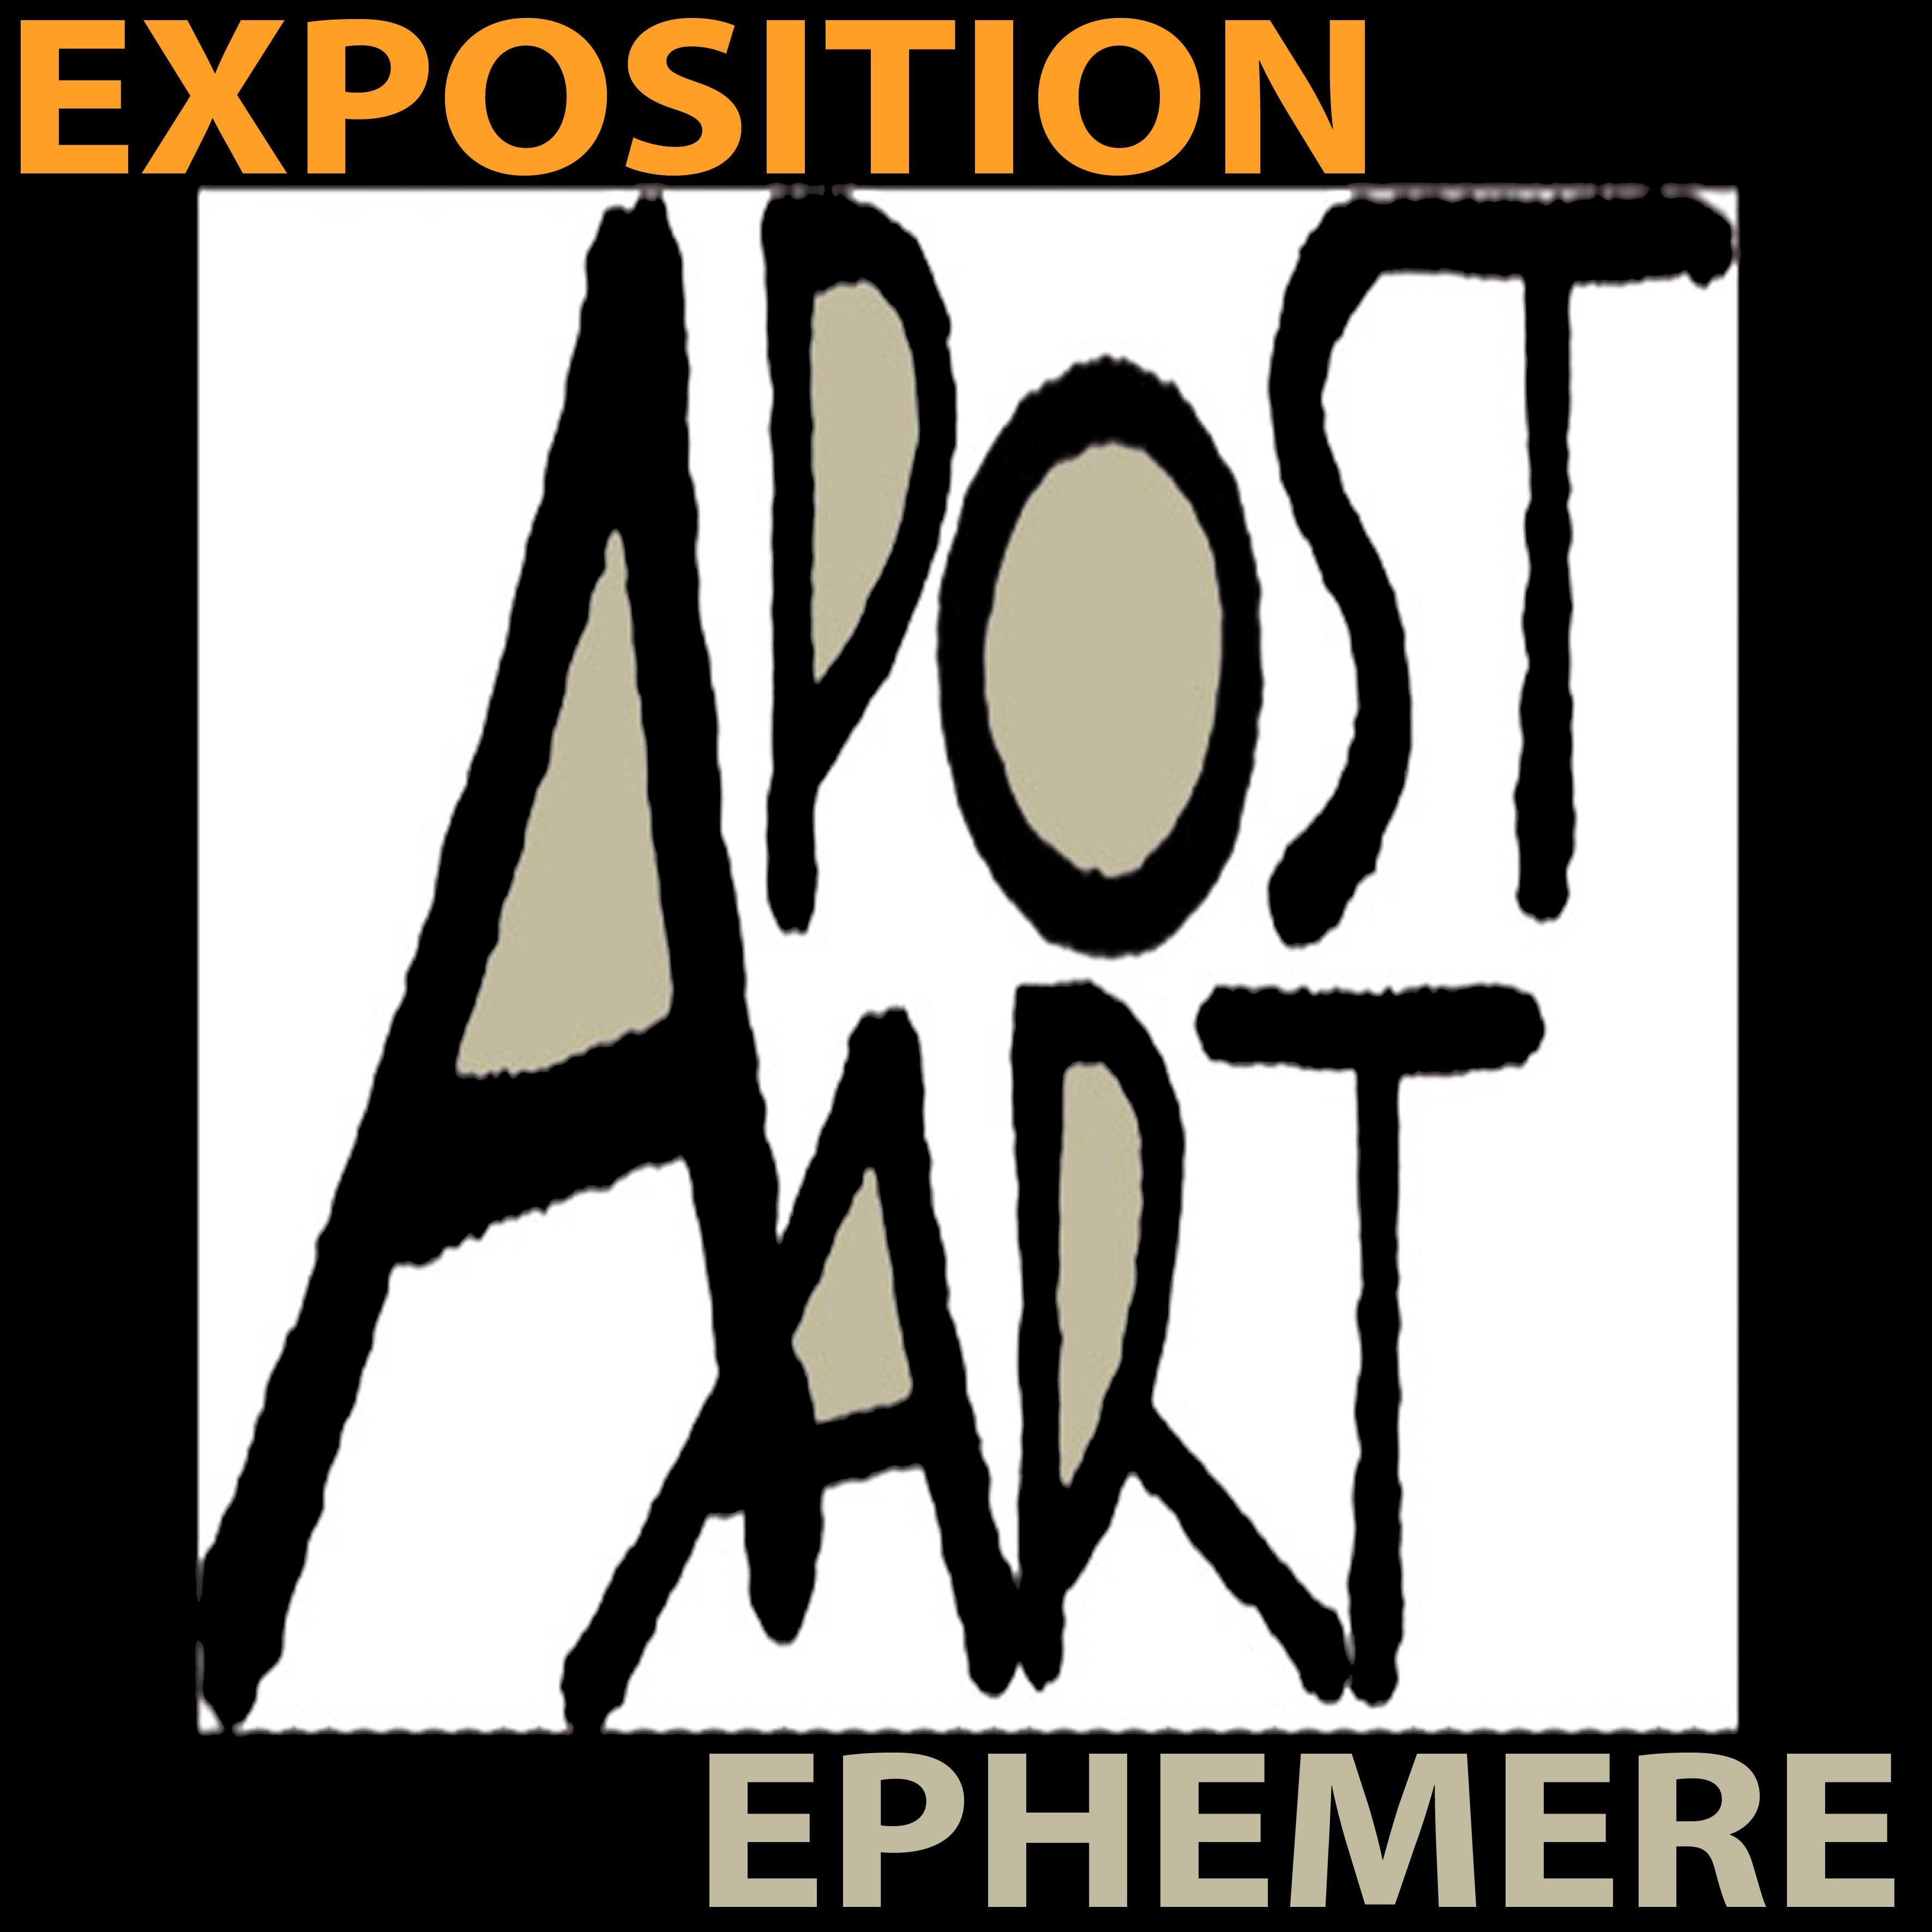 APOST'Art